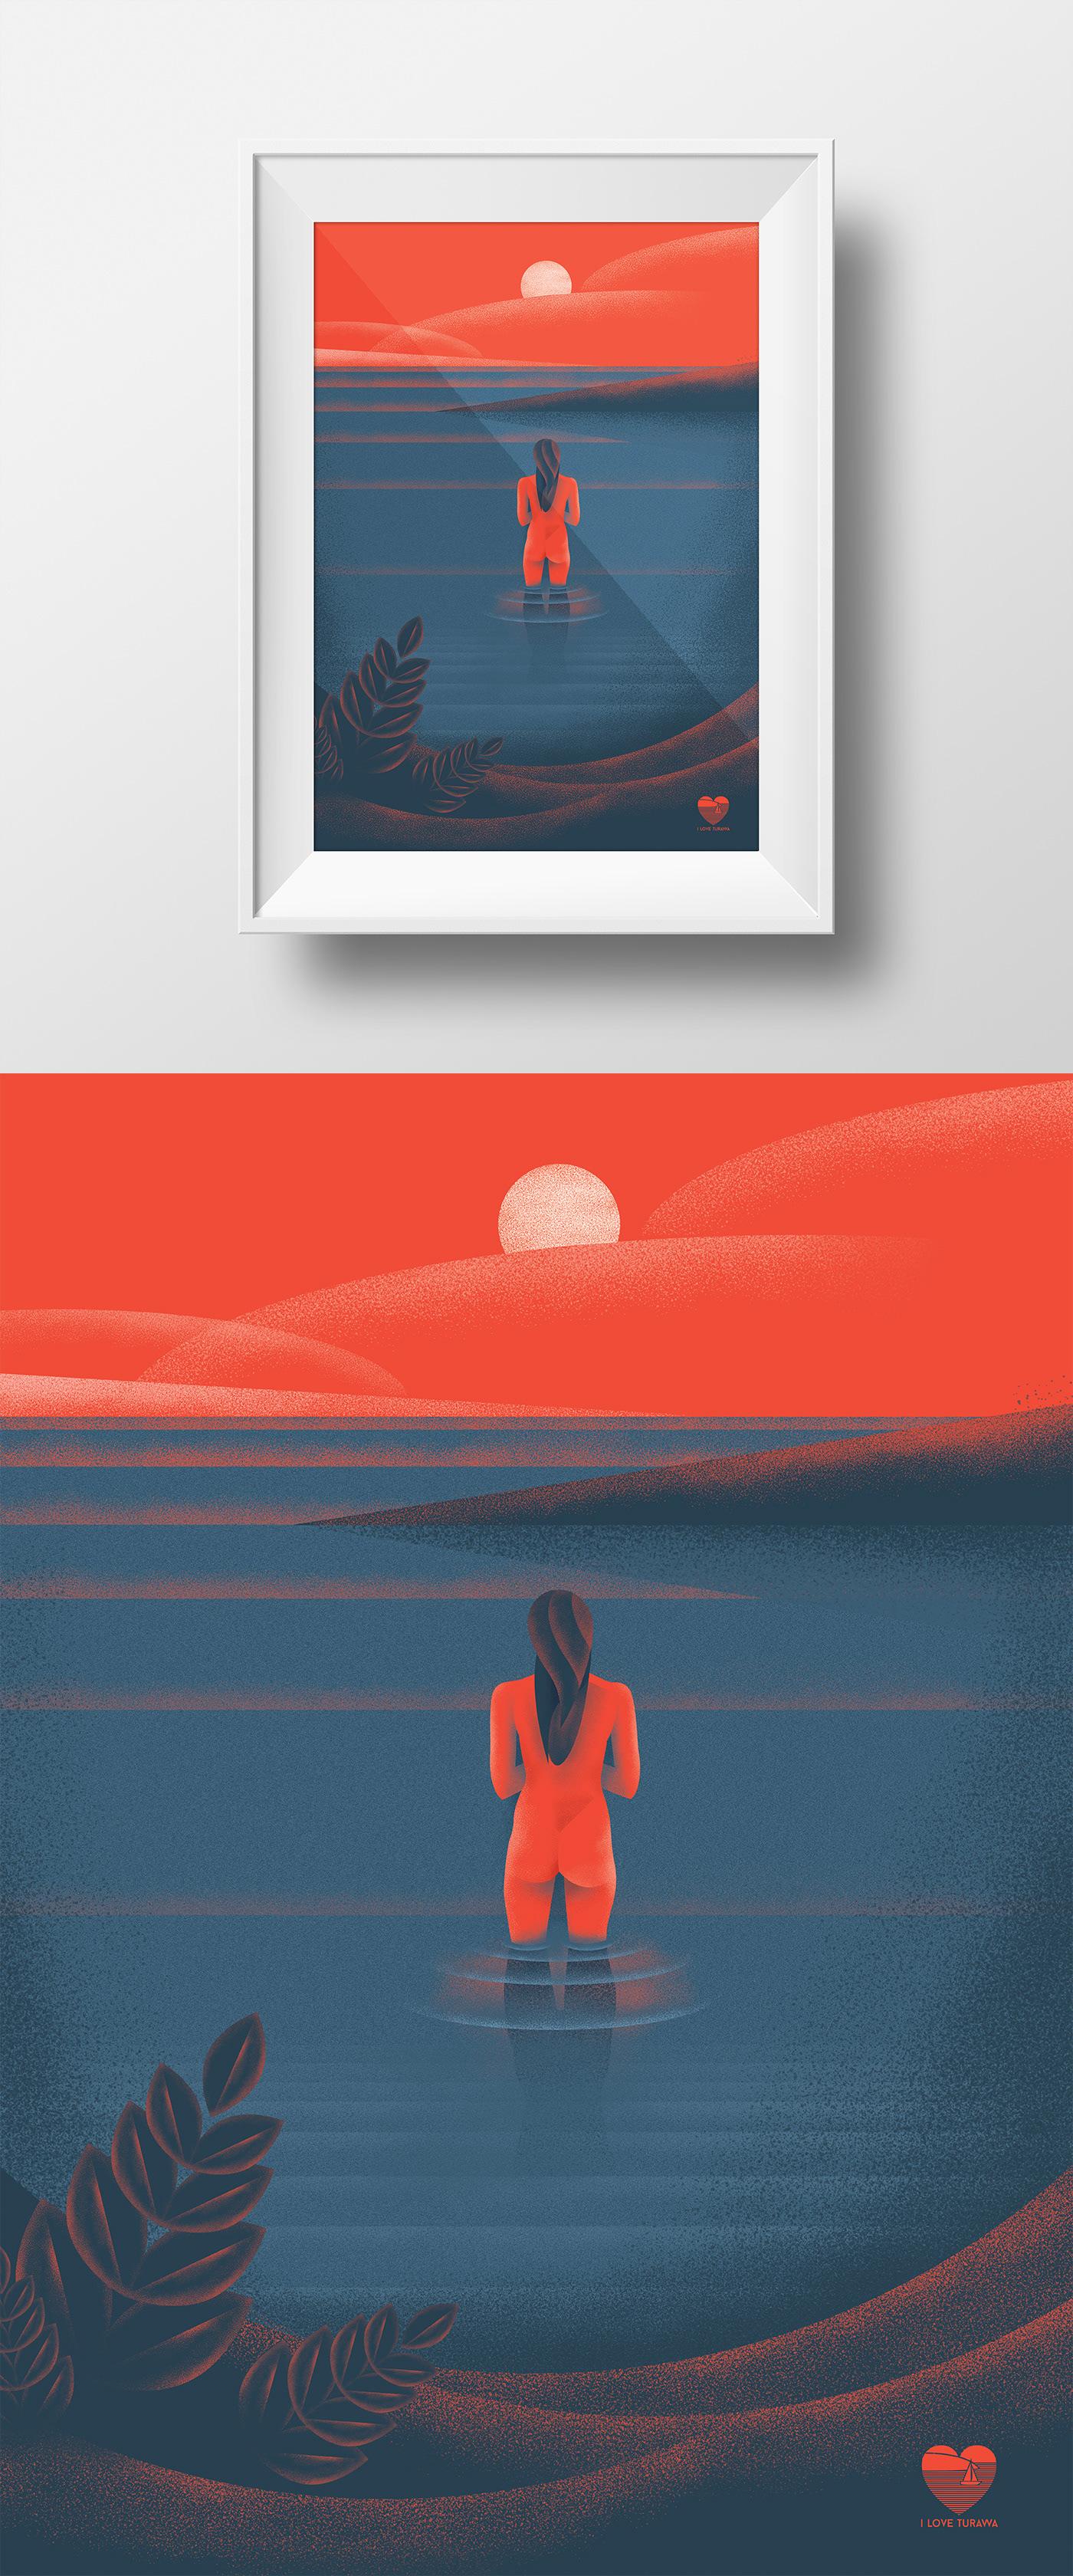 Image may contain: orange, abstract and screenshot